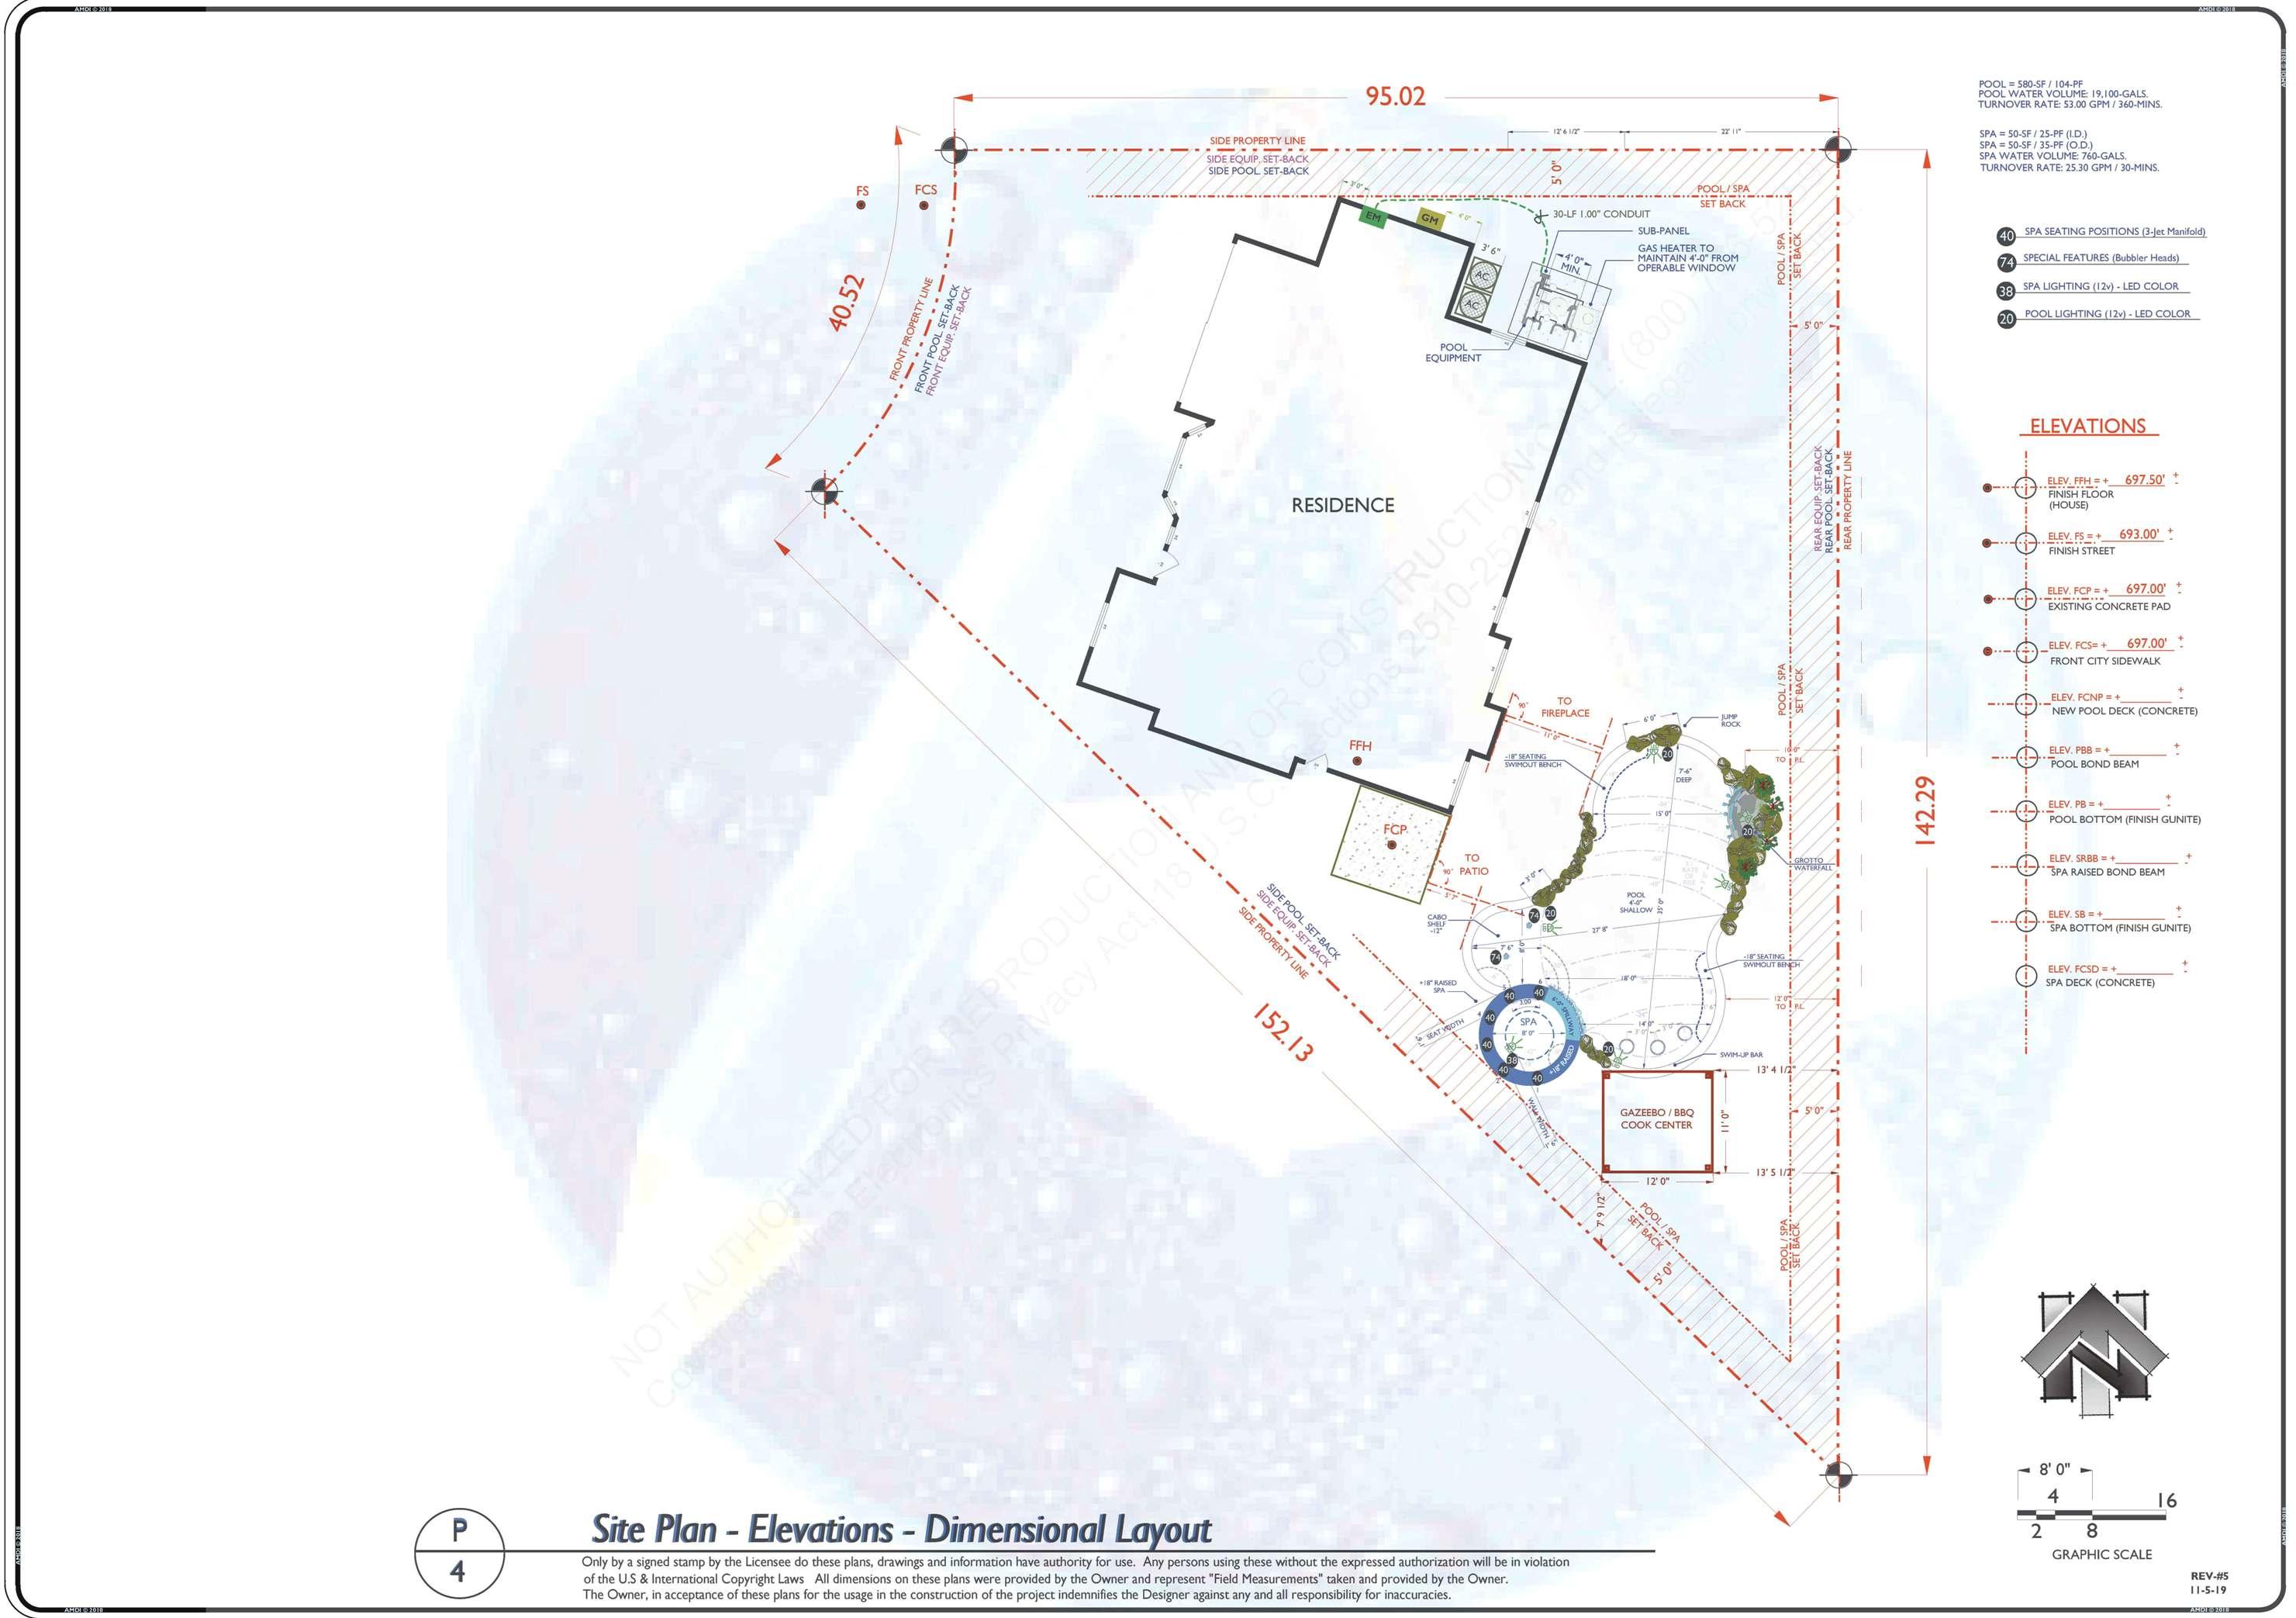 REV-6 SITE PLAN DIMENSIONAL LAYOUT